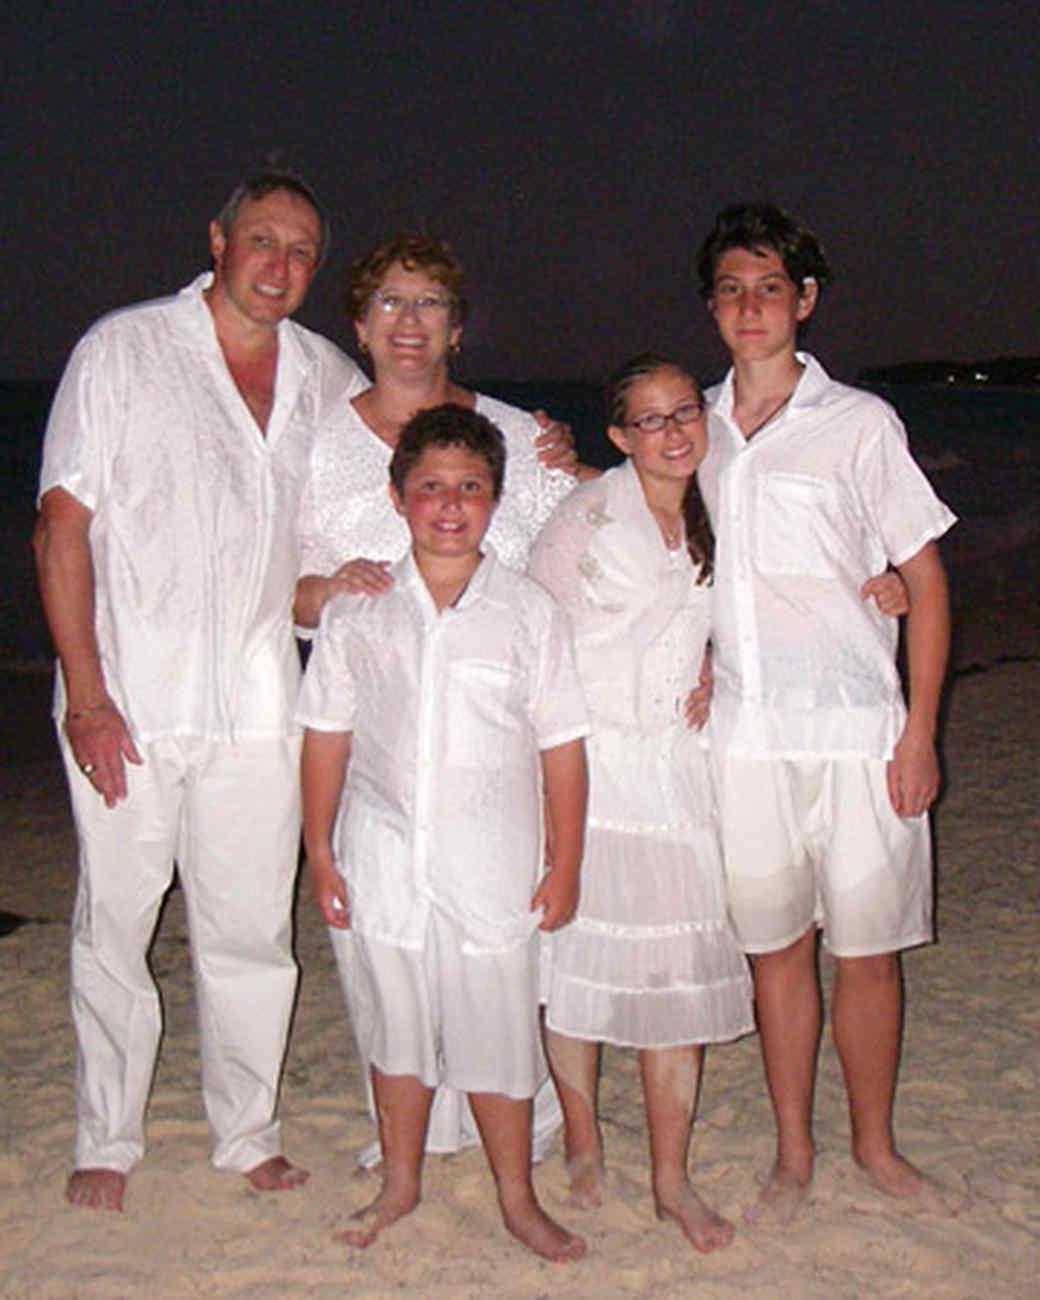 13_amys_family_jaffebarzach.jpg